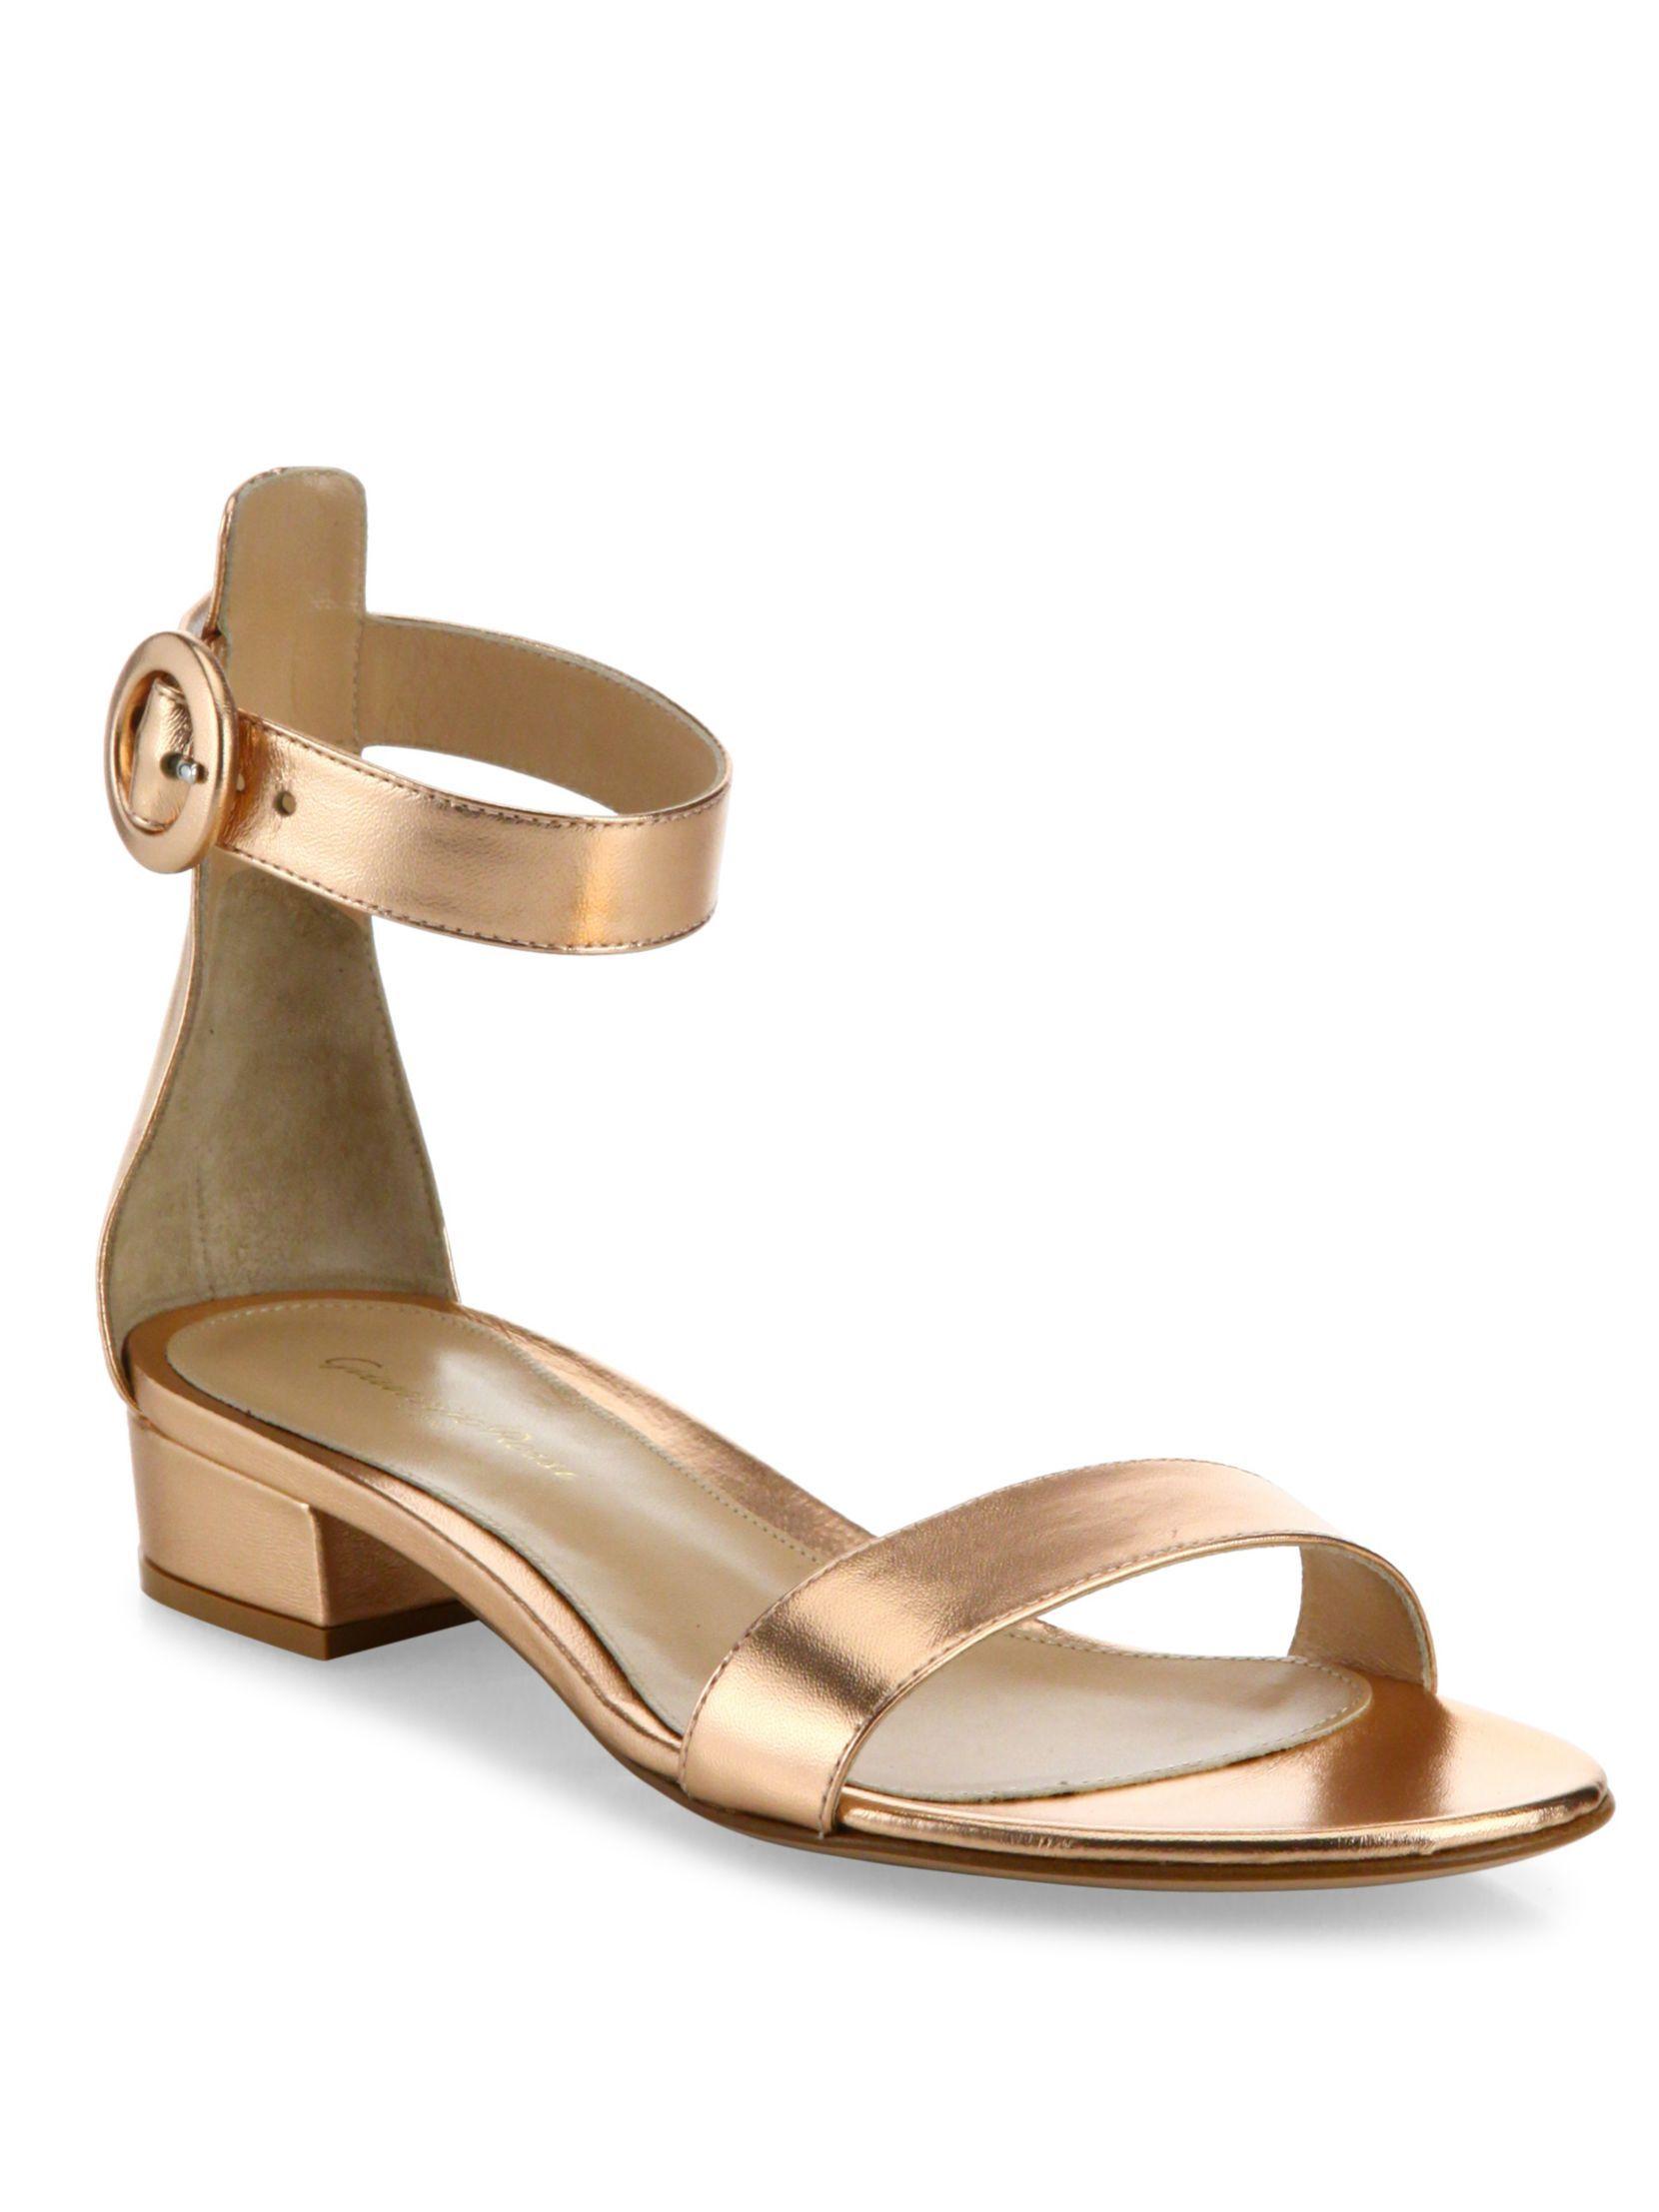 2642c616dca Gianvito Rossi Metallic Leather Ankle-Strap Sandals